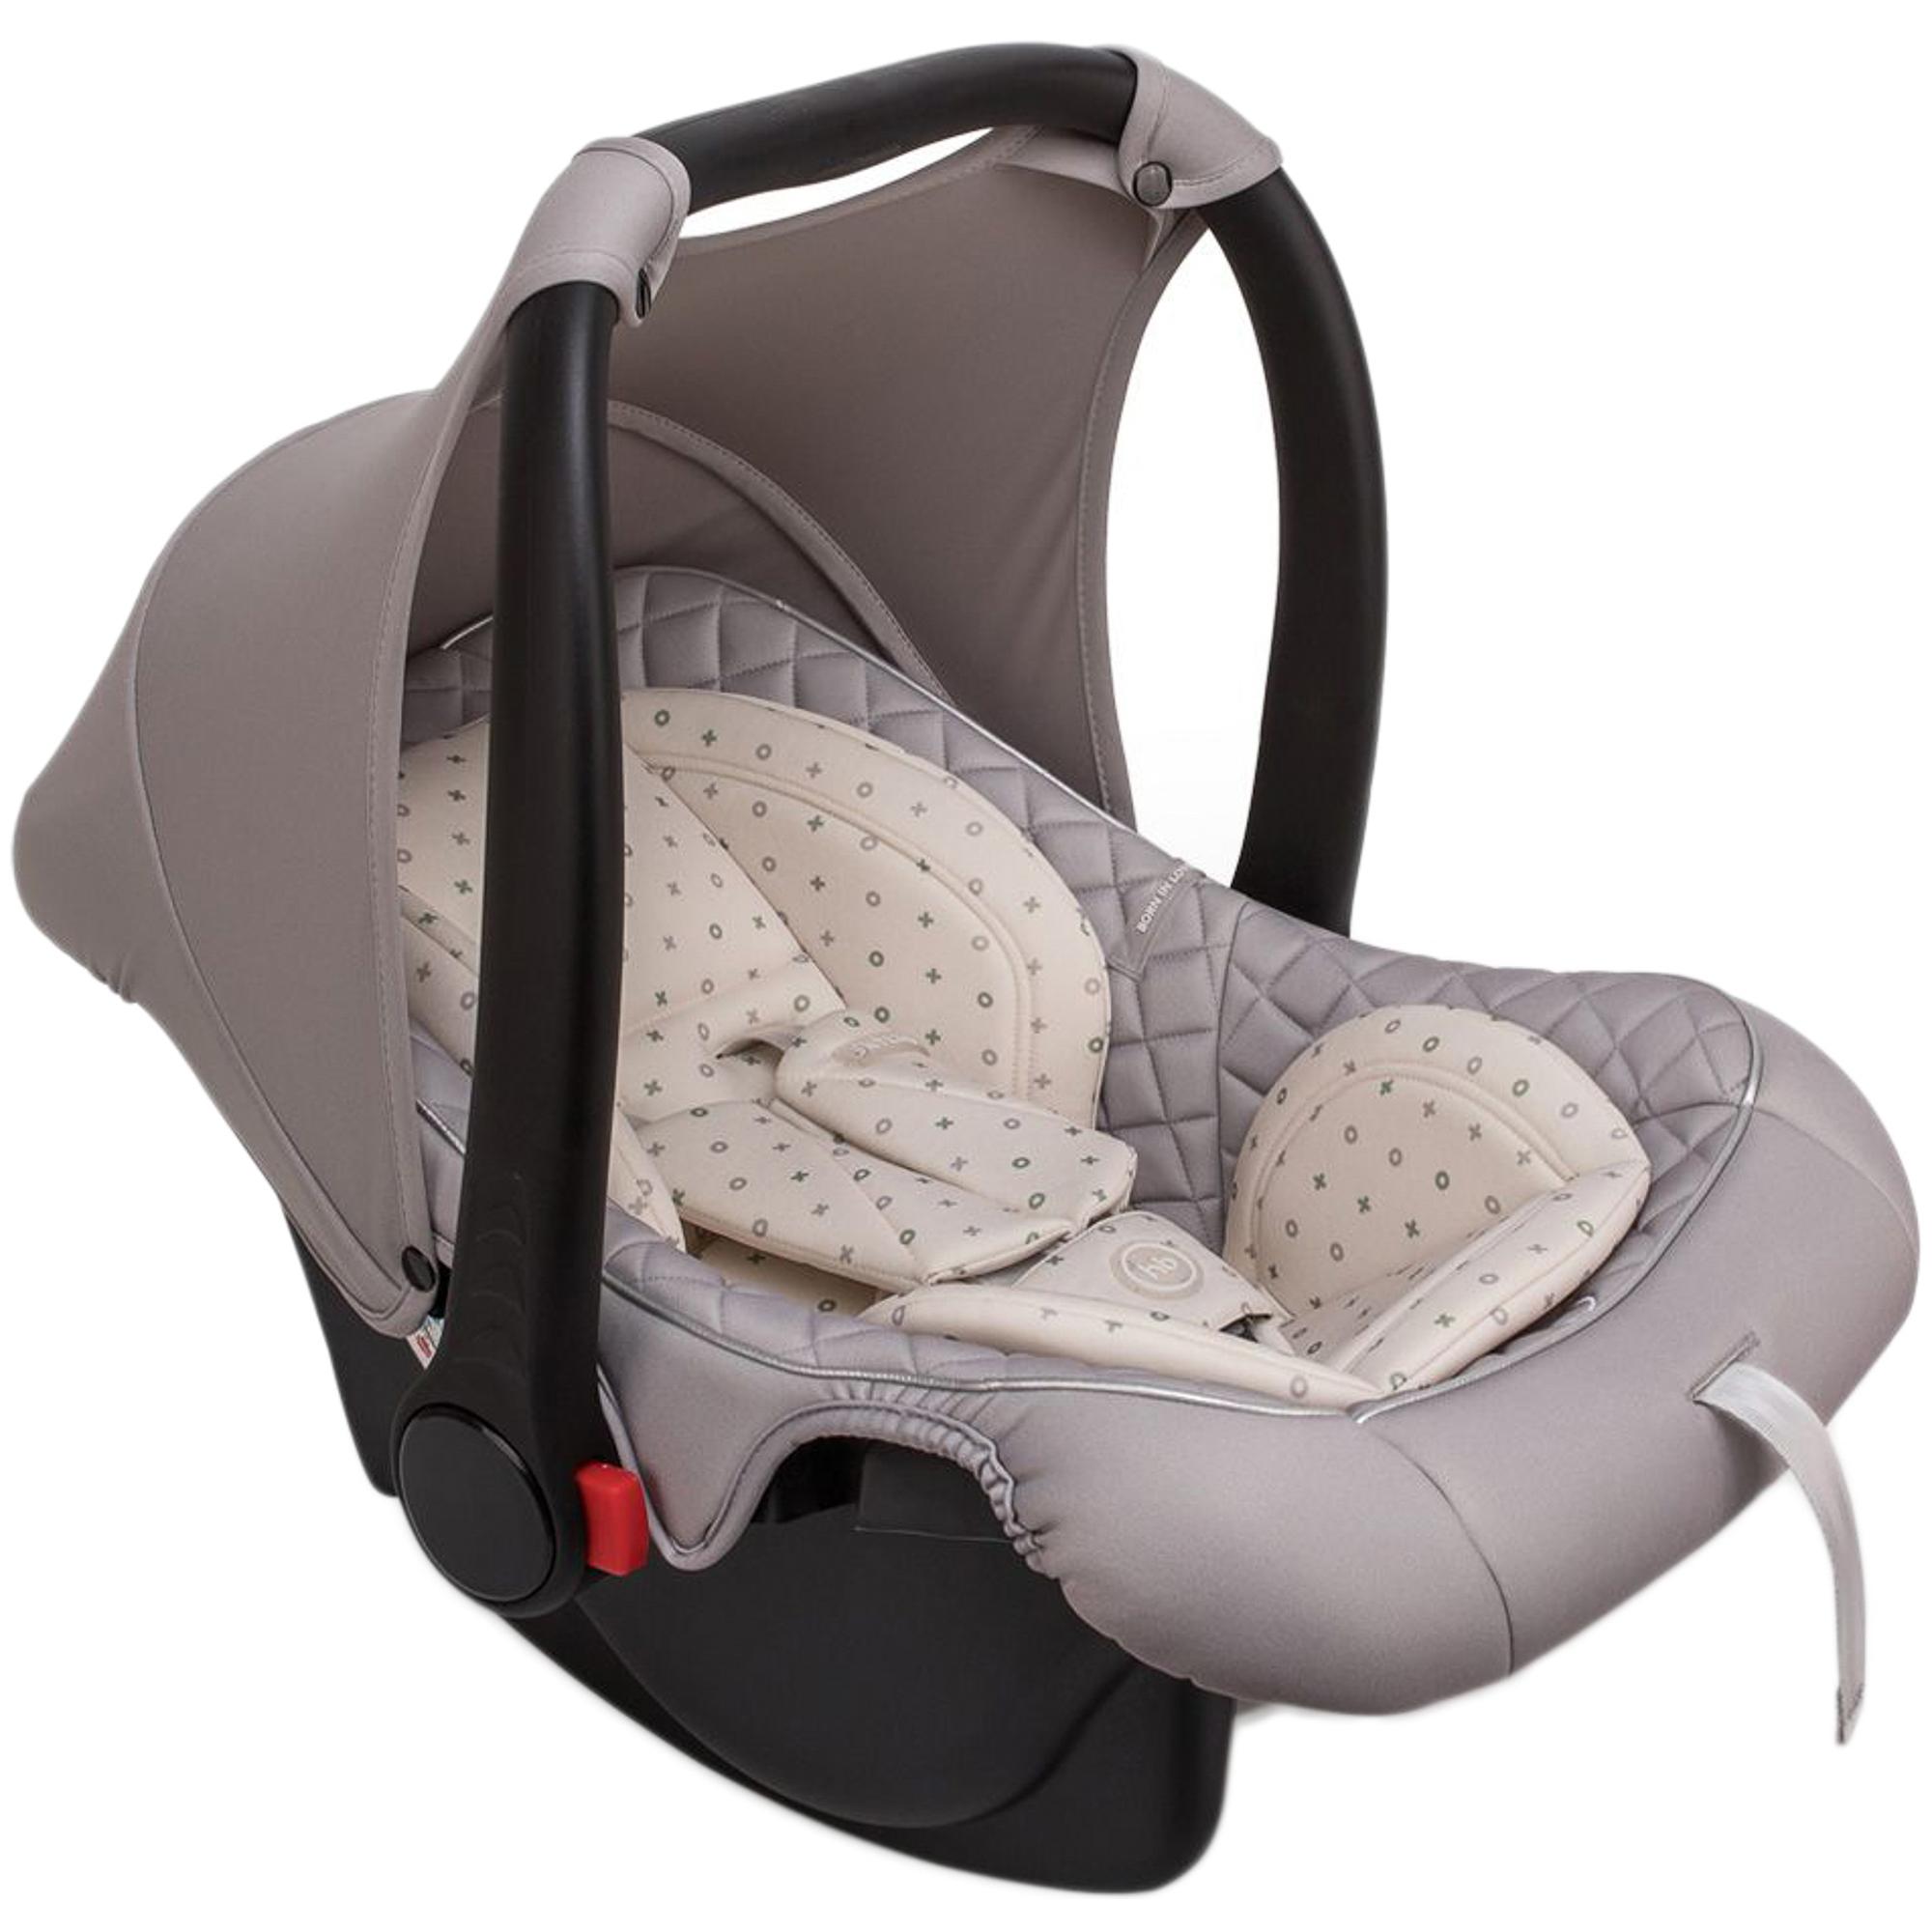 Фото - Автокресло-переноска Happy Baby Skyler V2 Stone автокресло happy baby passenger v2 graphite черный